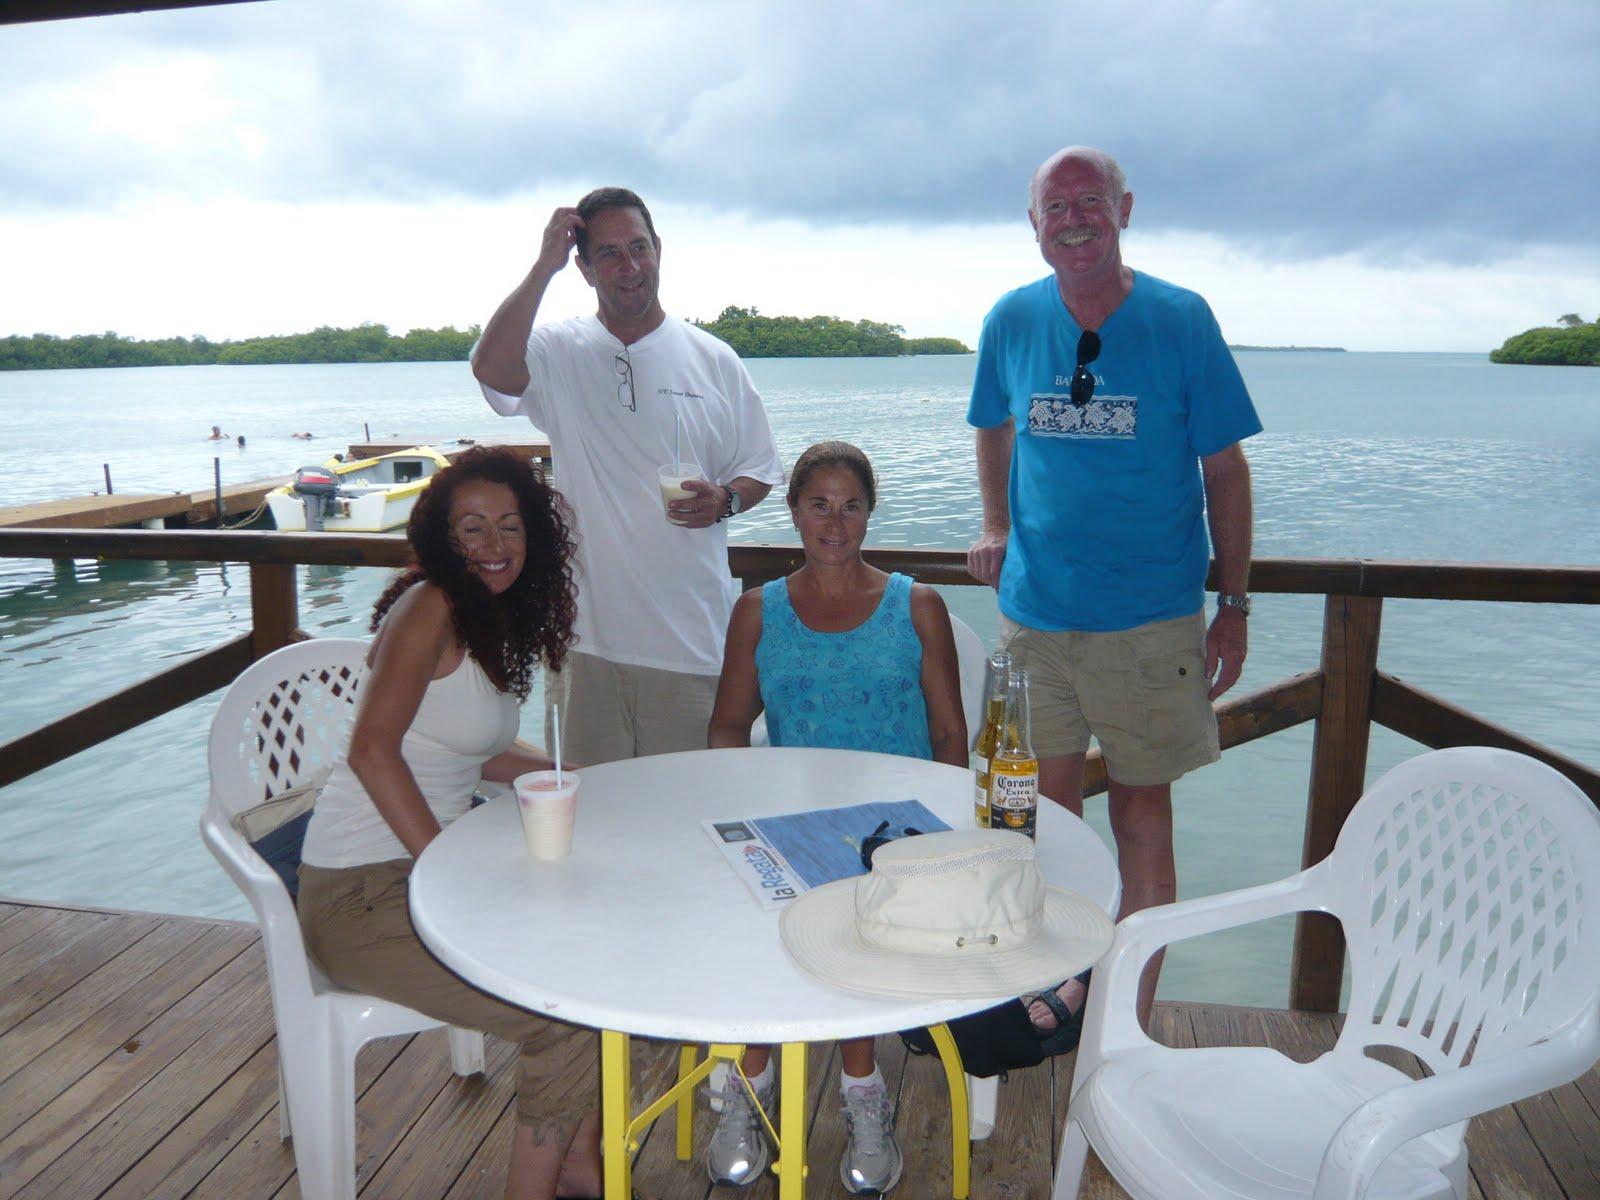 http://3.bp.blogspot.com/_5gOJ9V85V2w/S8pODfRpxzI/AAAAAAAAAxU/91VCgGfQUug/s1600/Tony+Denise+and+Vieques+059.JPG